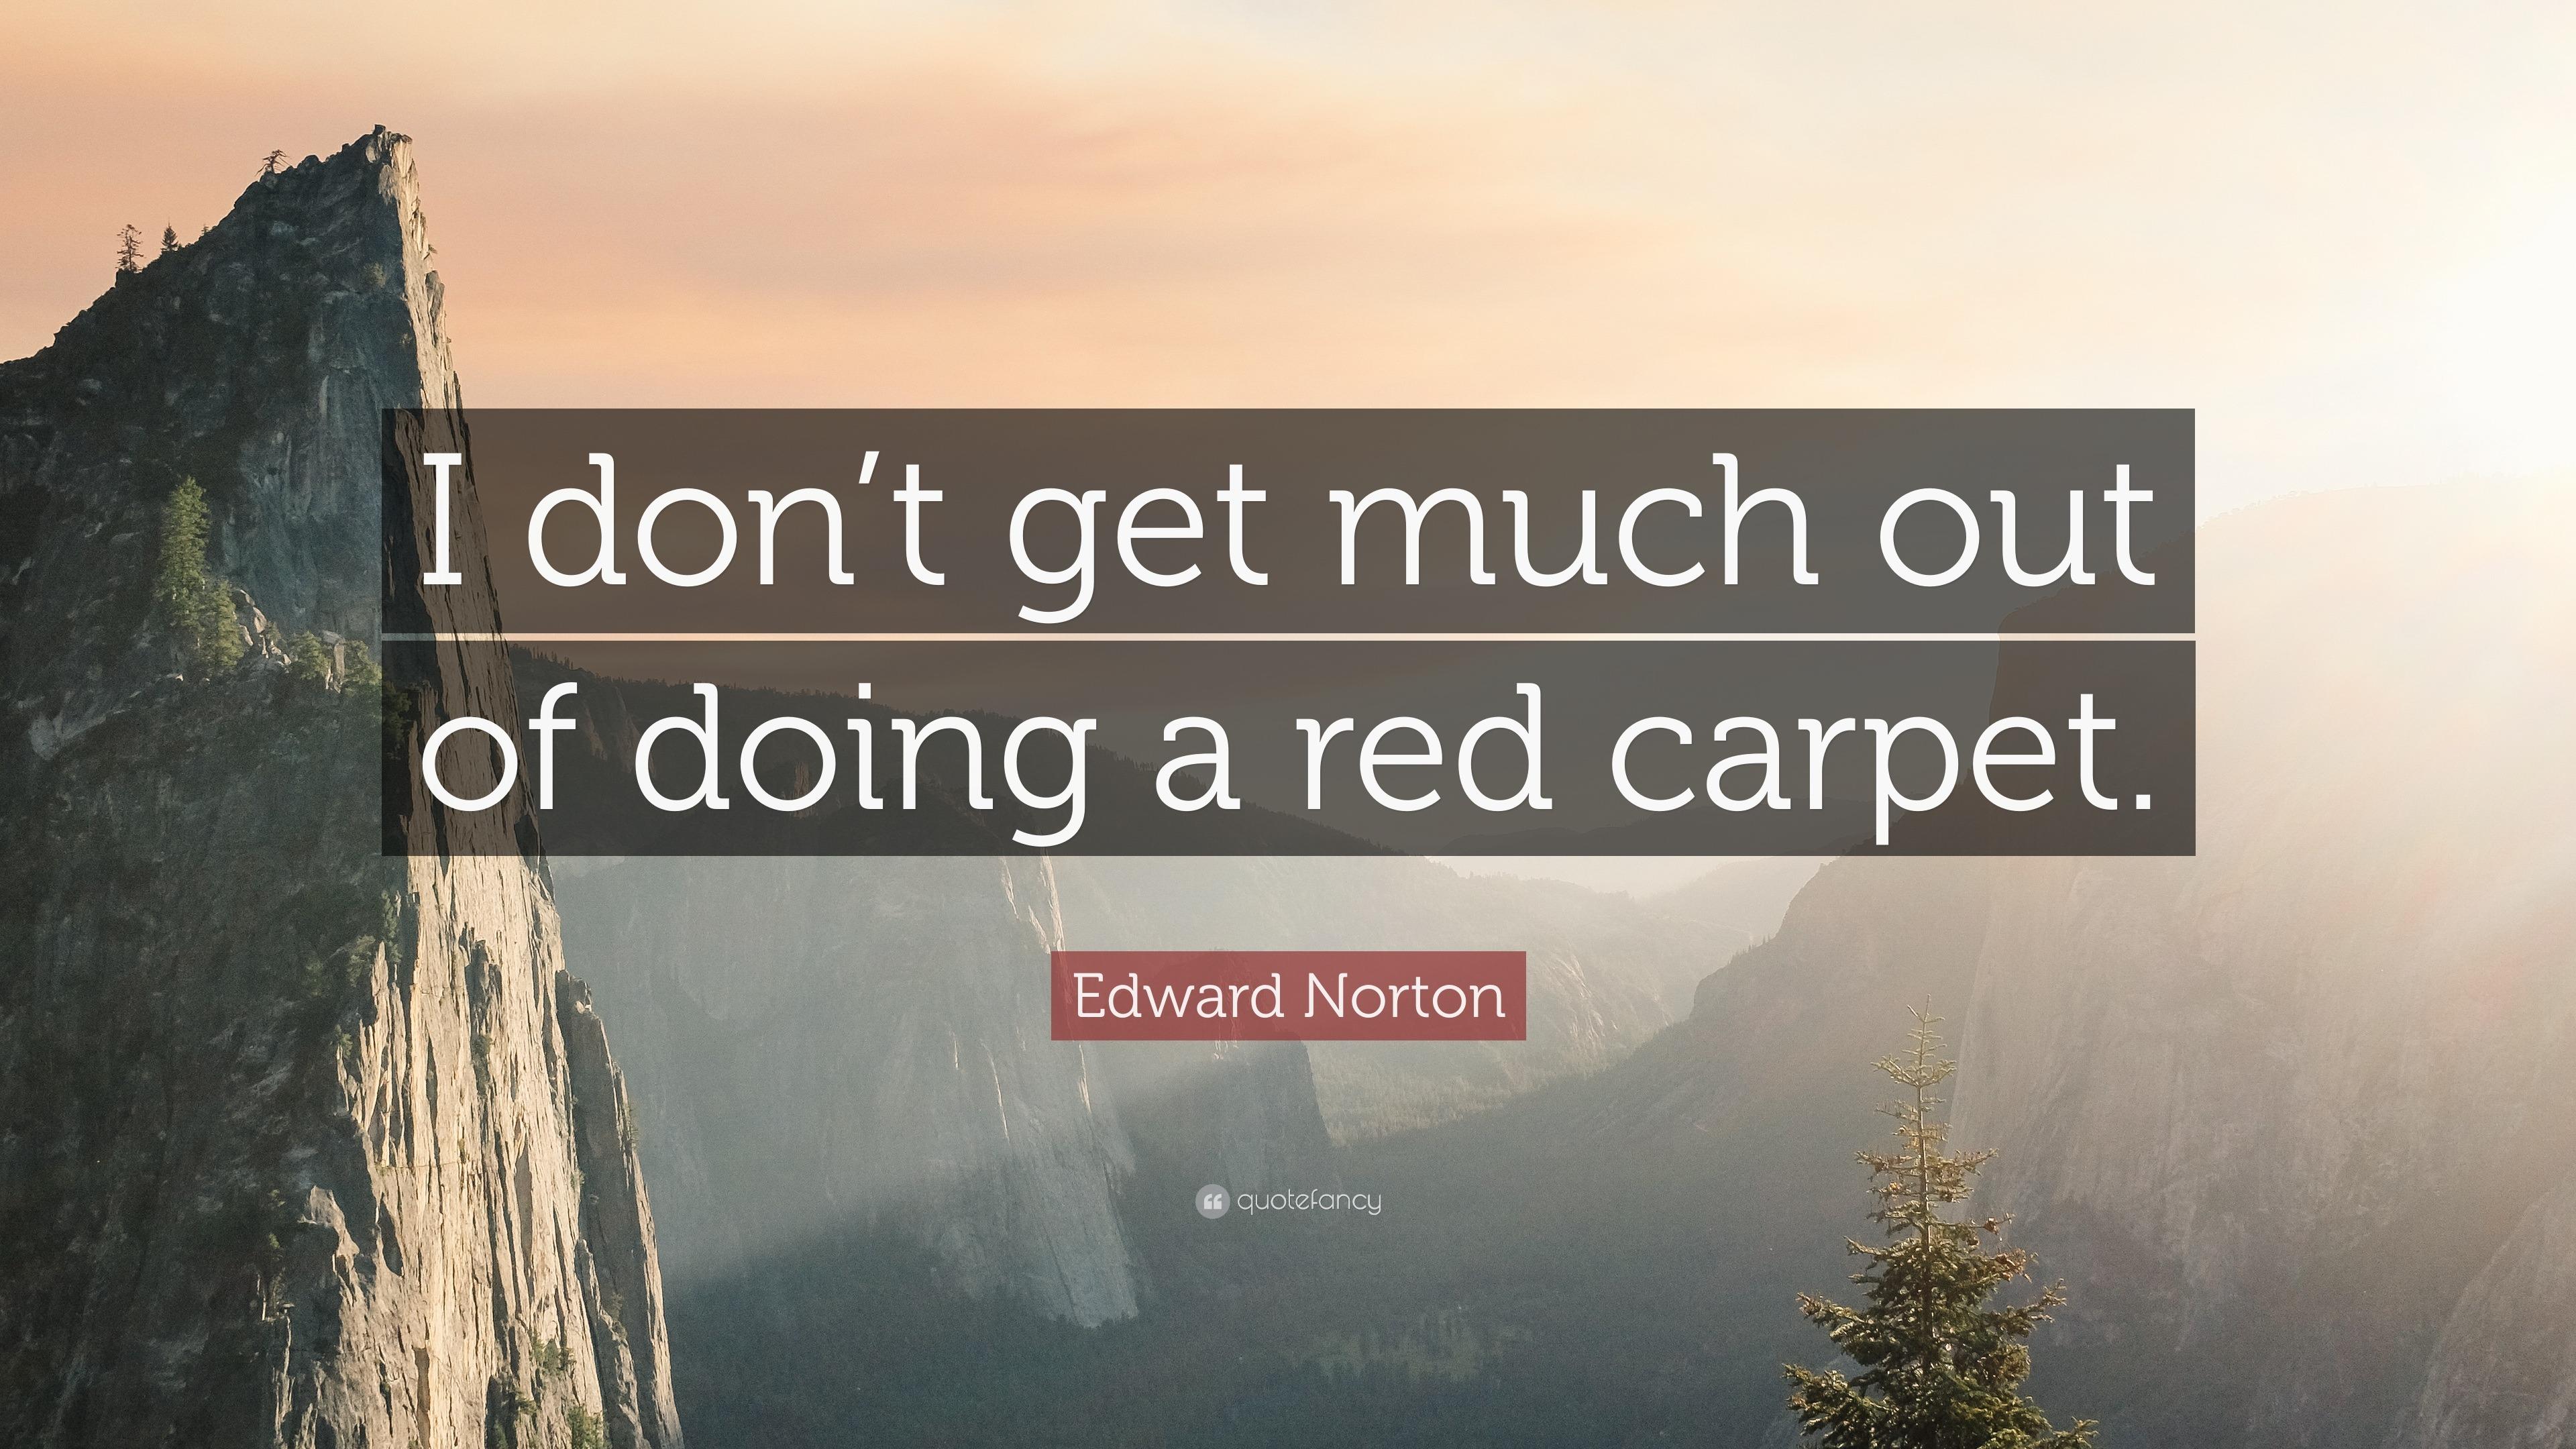 Edward Norton Quotes: Edward Norton Quotes (100 Wallpapers)